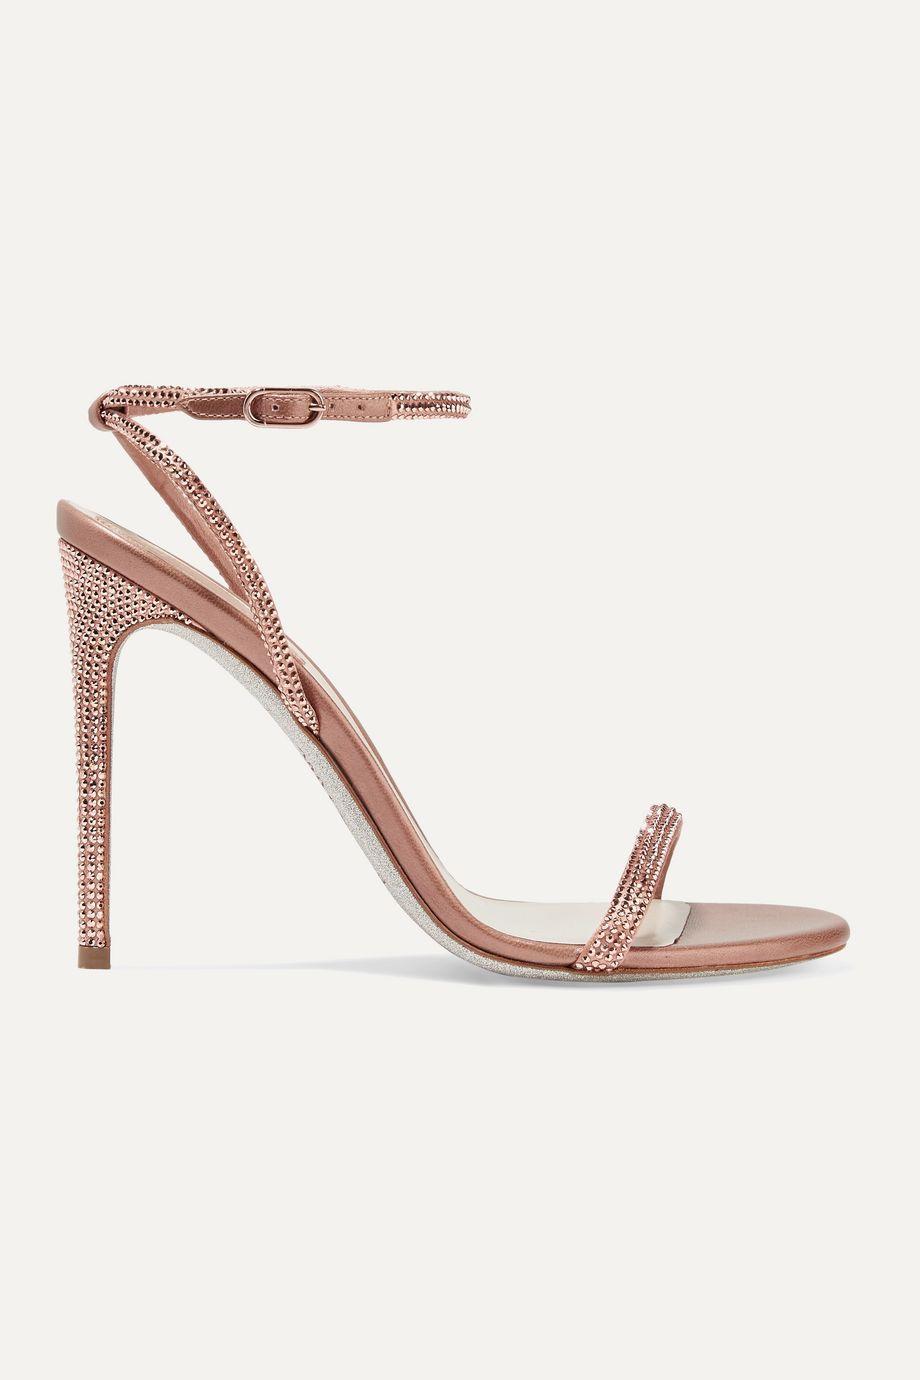 René Caovilla 水晶缀饰缎布金属感皮革凉鞋